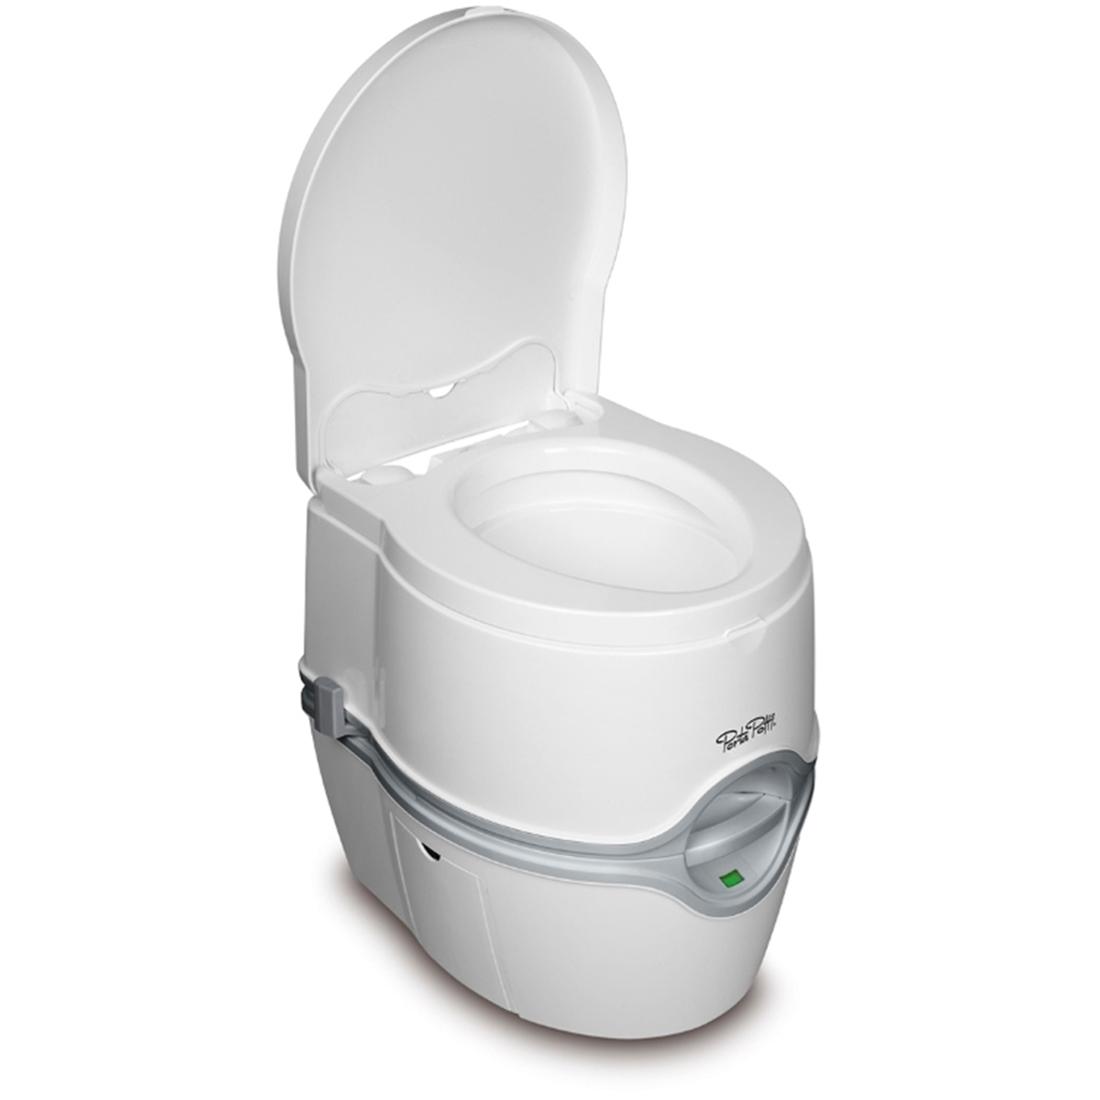 Thetford Porta Potti 565E Electric Pump - Home toilet style